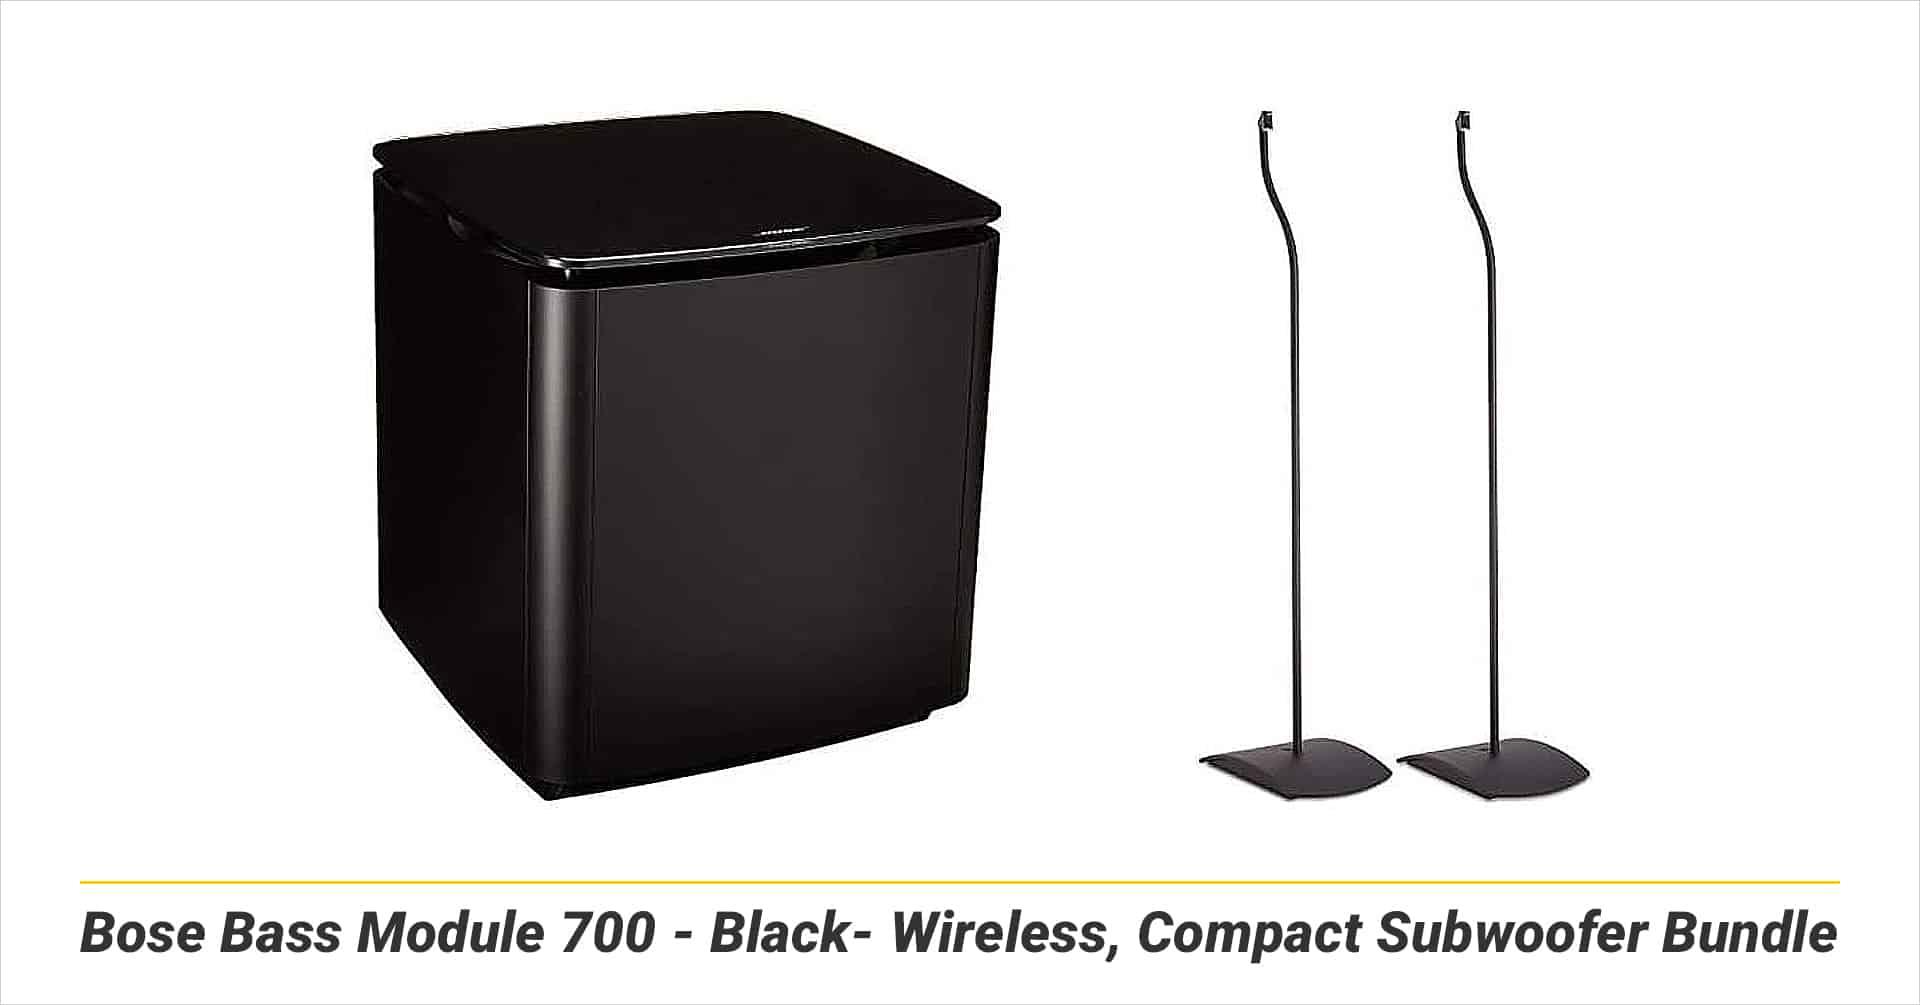 Bose Bass Module 700 - Black- Wireless, Compact Subwoofer Bundle